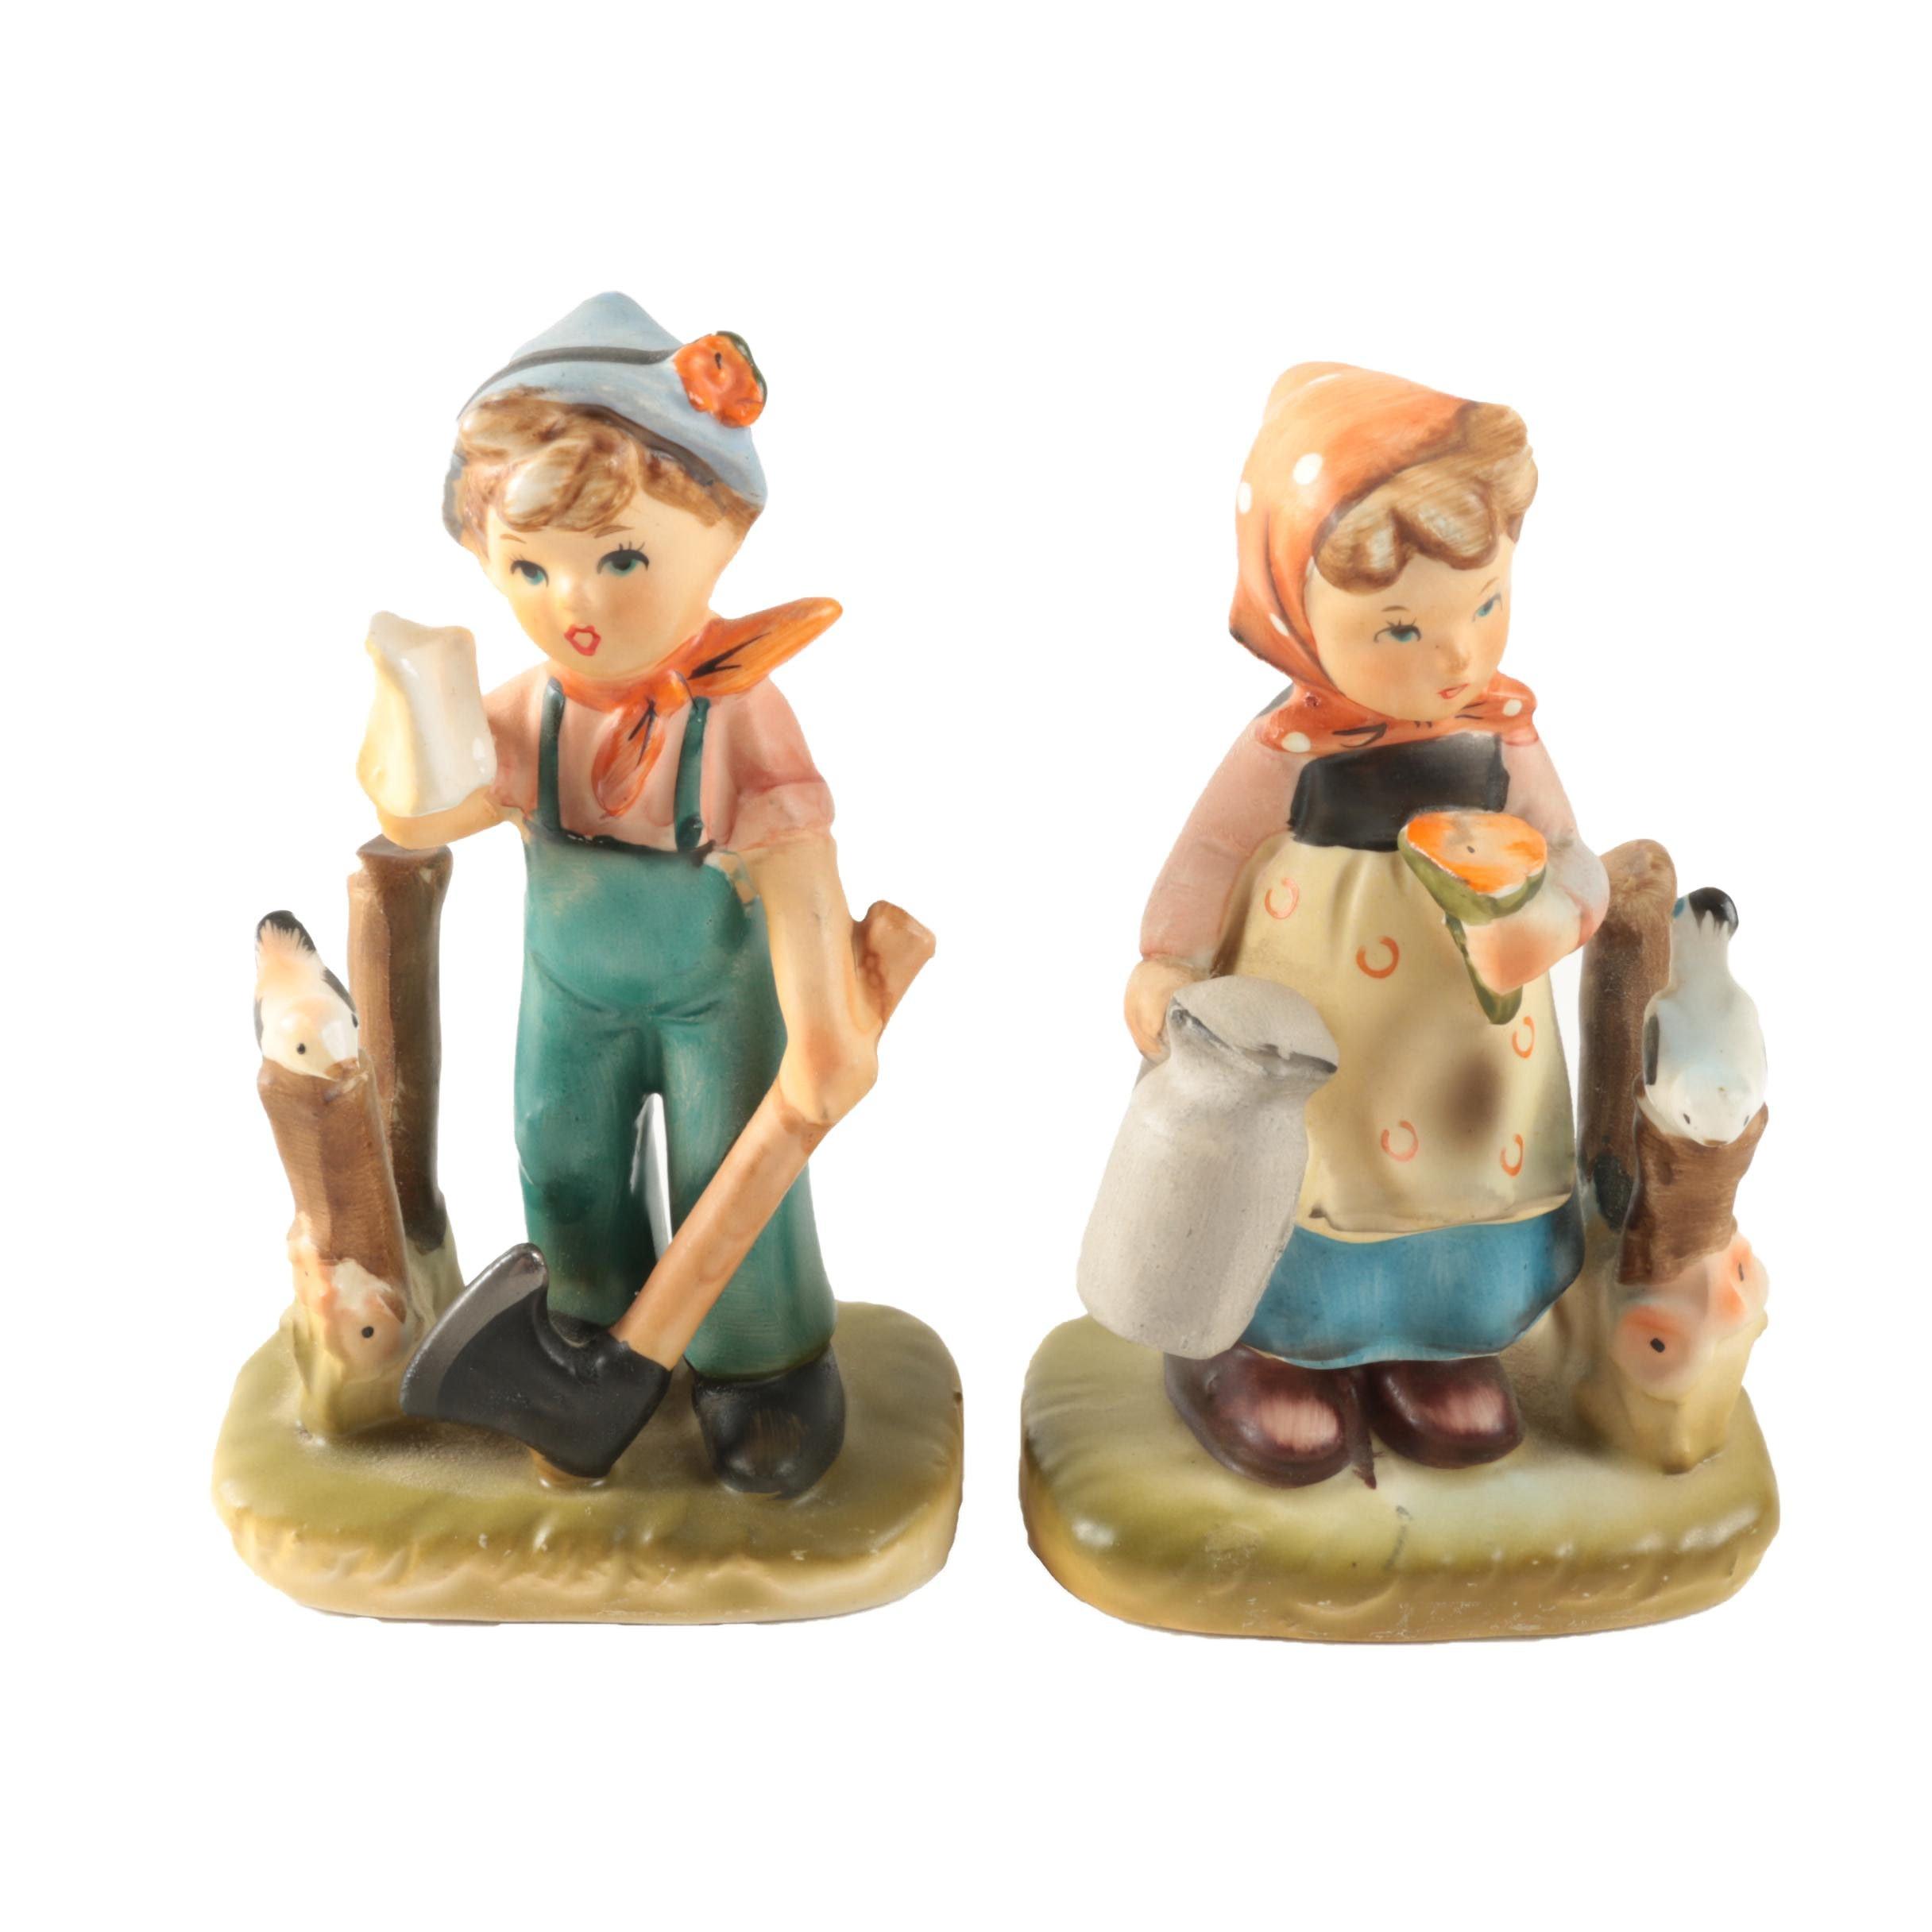 Arnart 5th Avenue Handpainted Figurines